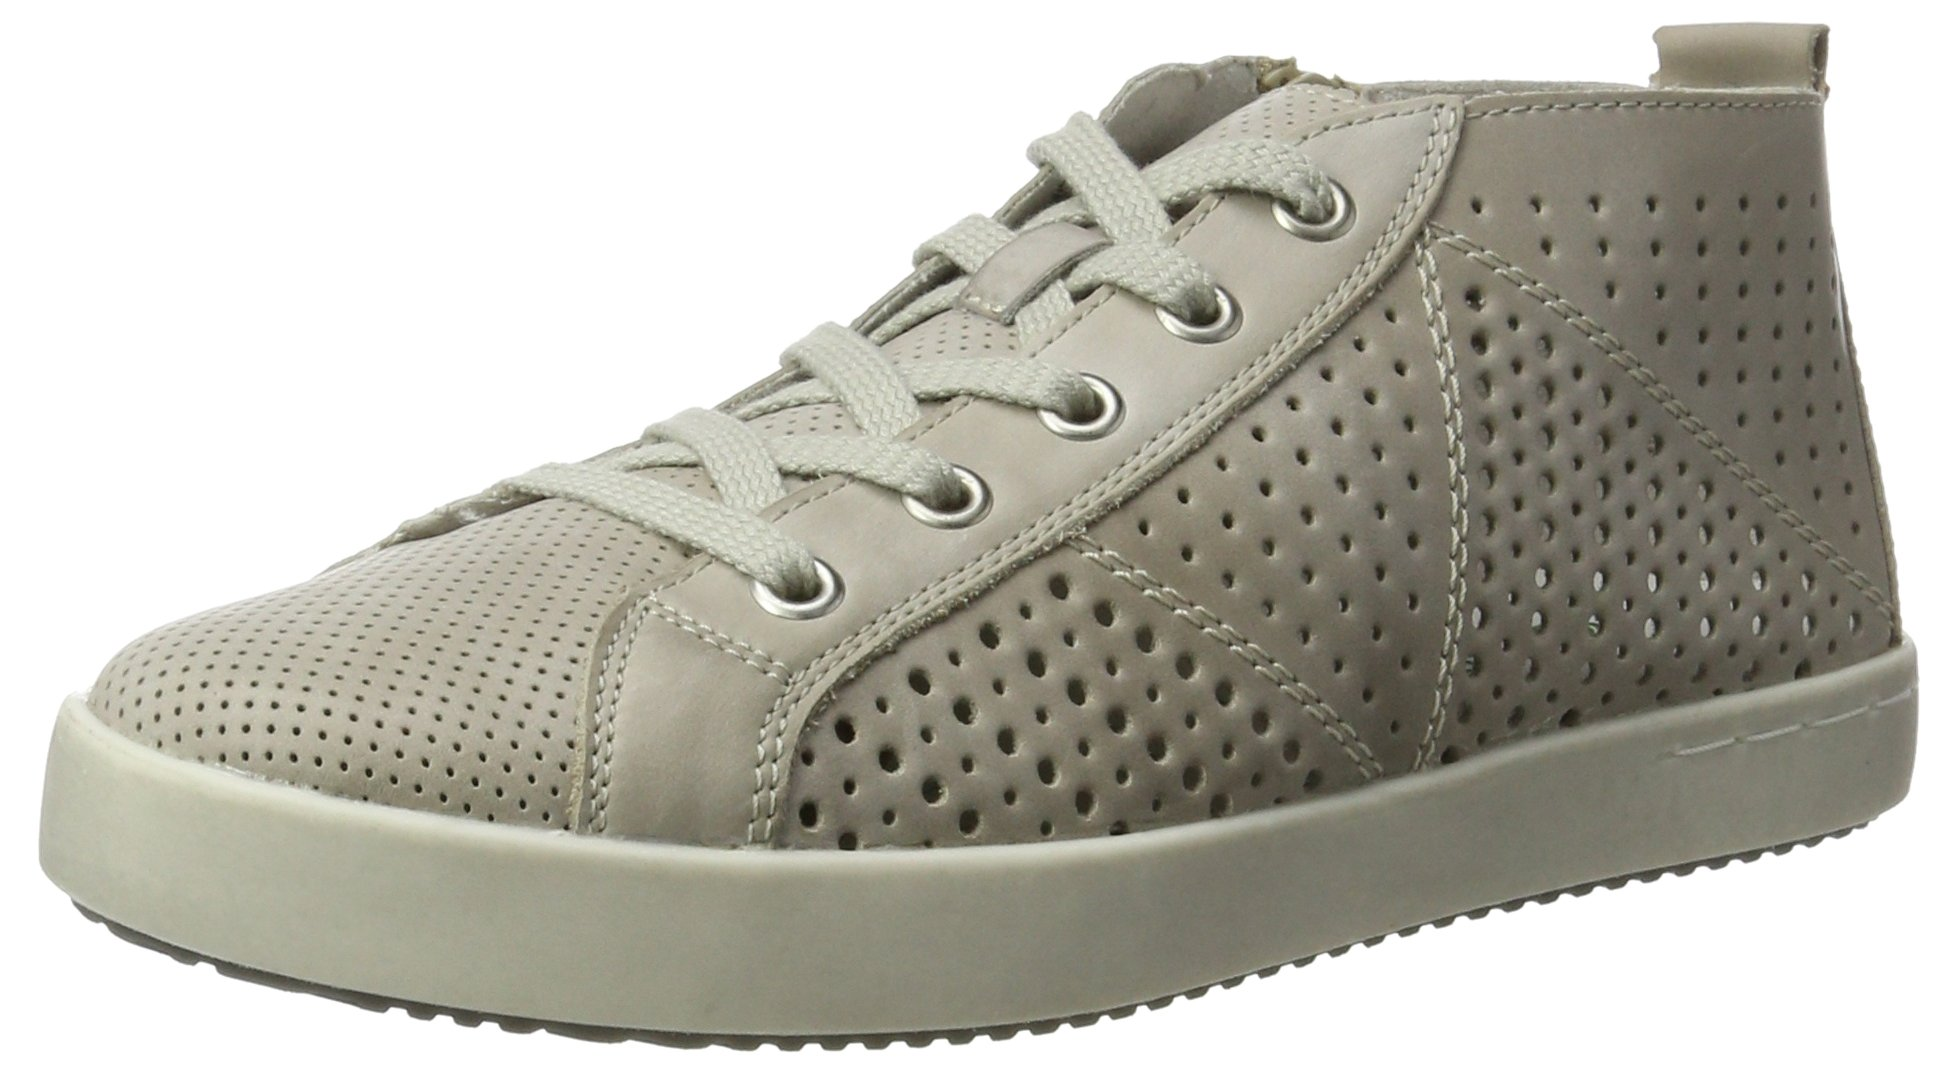 Hautes 8140 Eu FemmeGrisice D5272Sneakers ice Remonte yO0wN8nvm